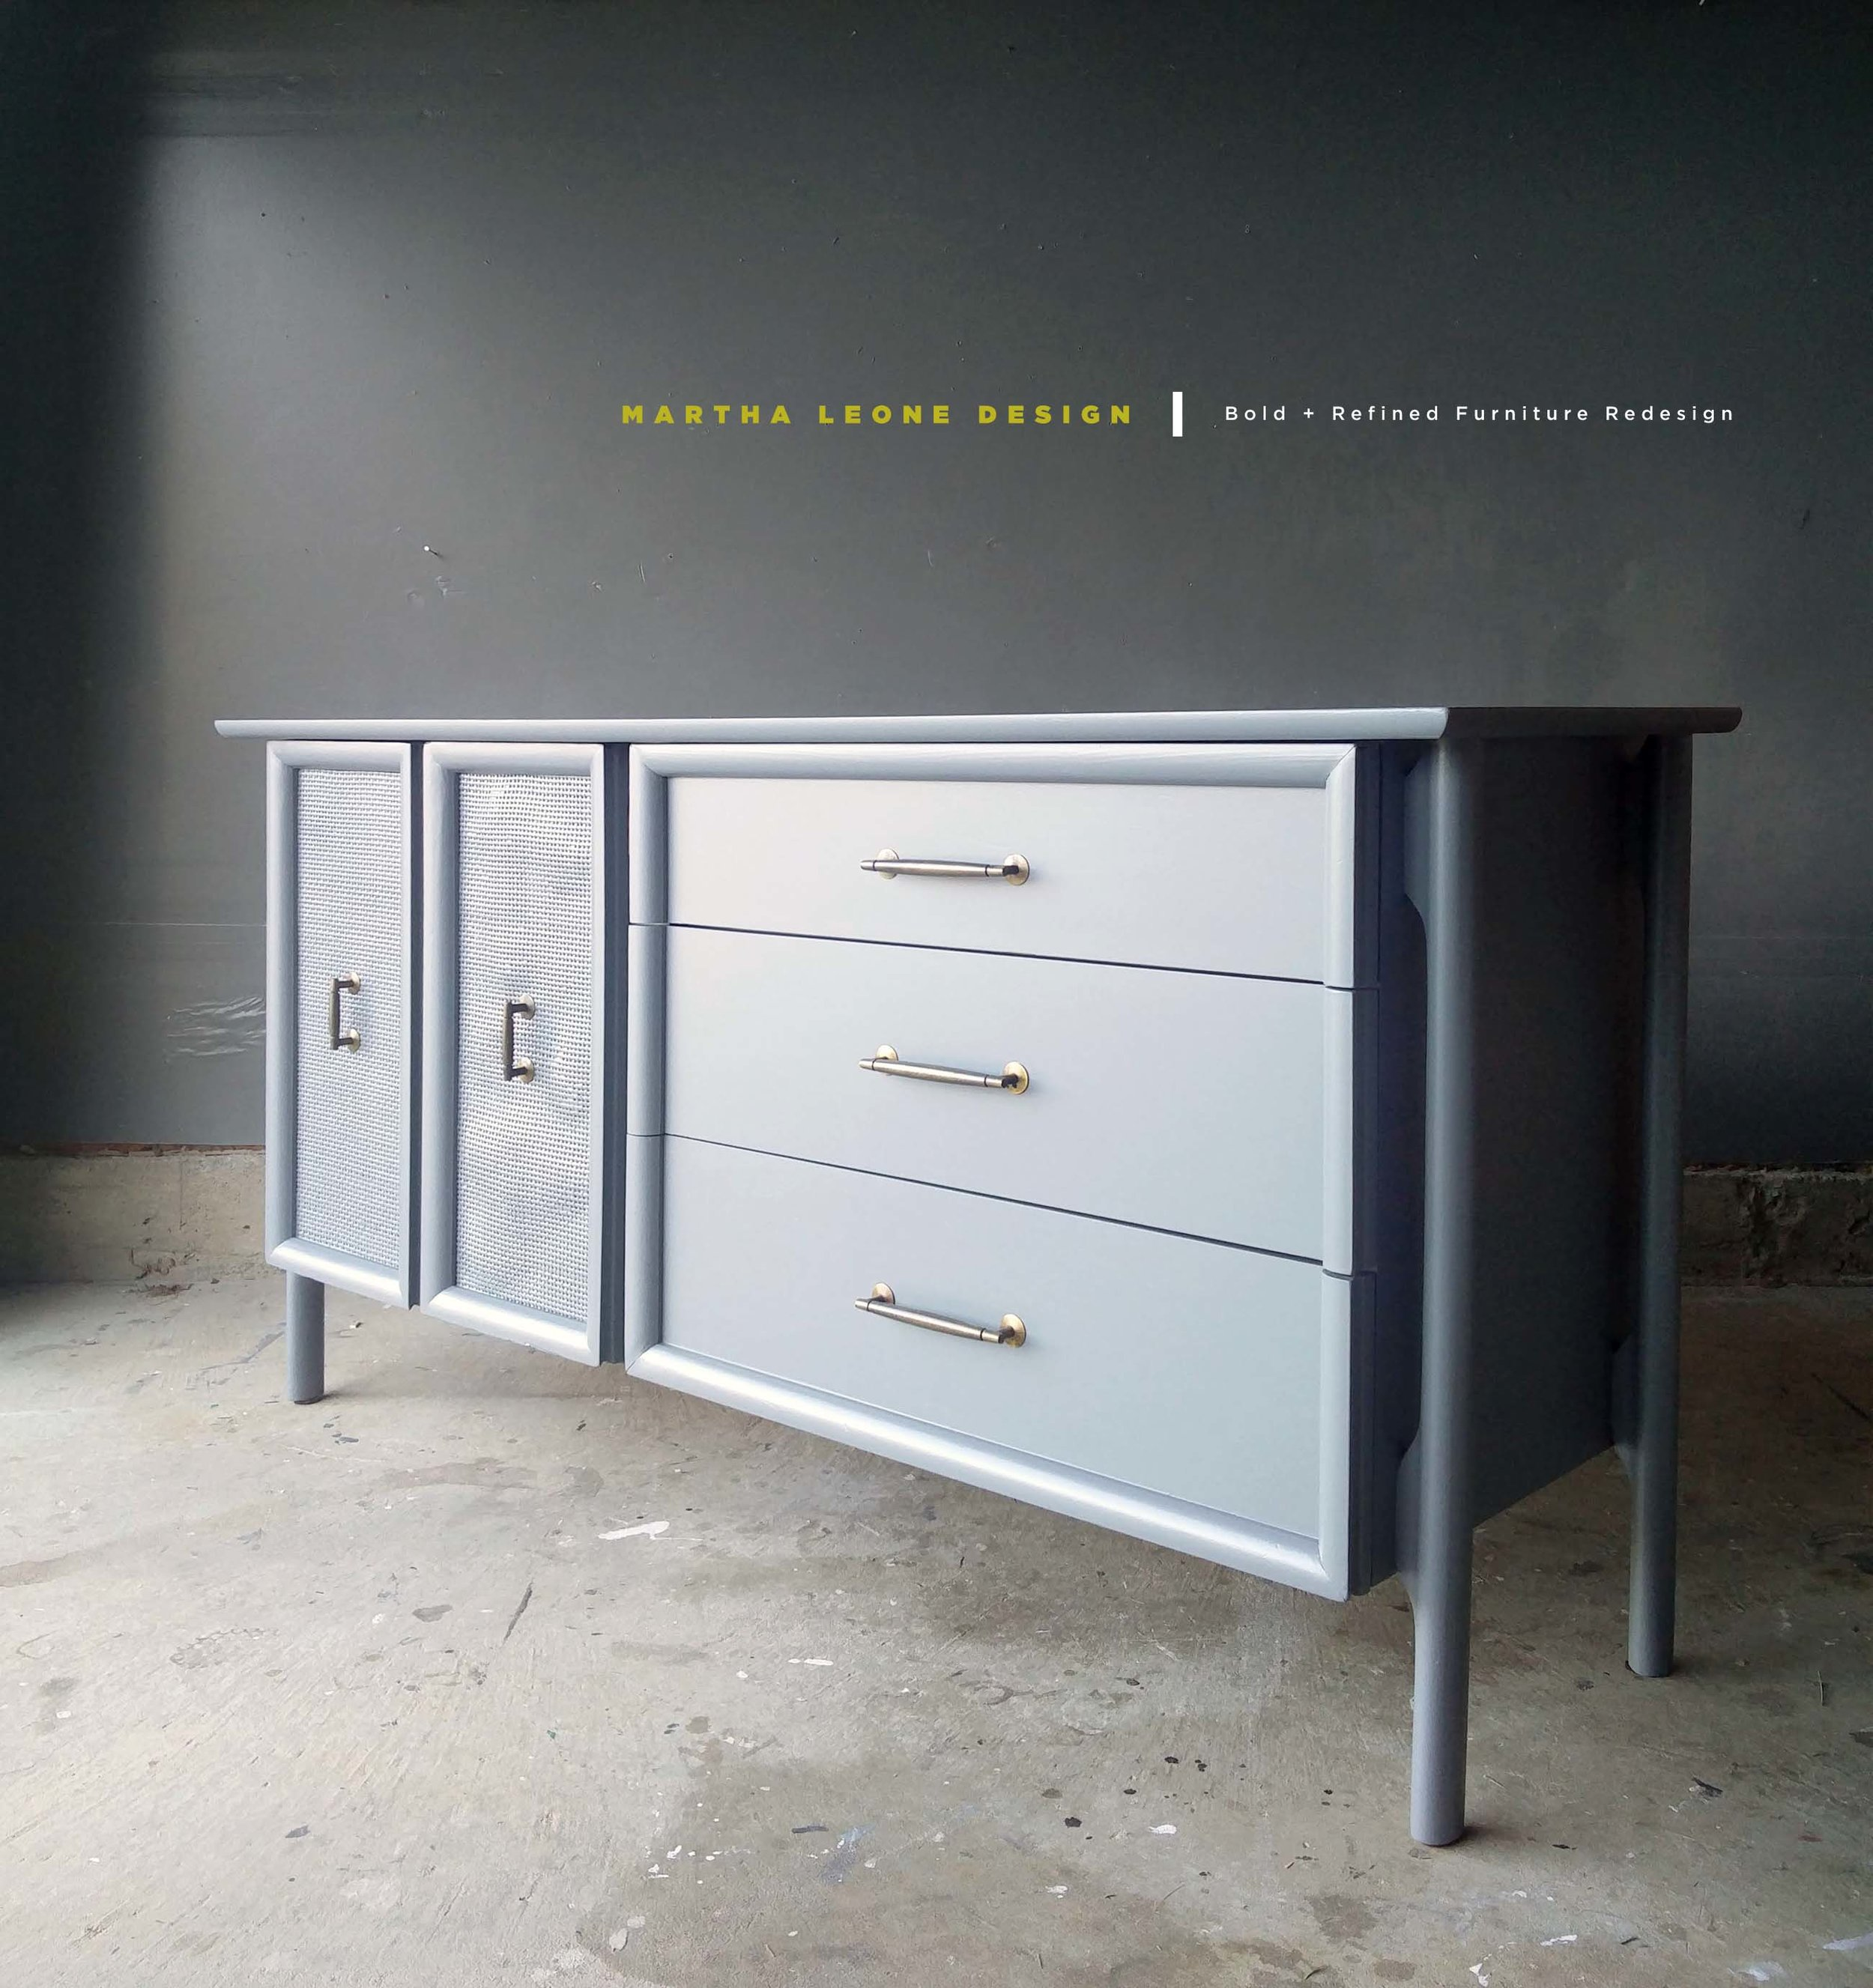 For    Nicole Lanteri Design    — Client's home, Washington, DC